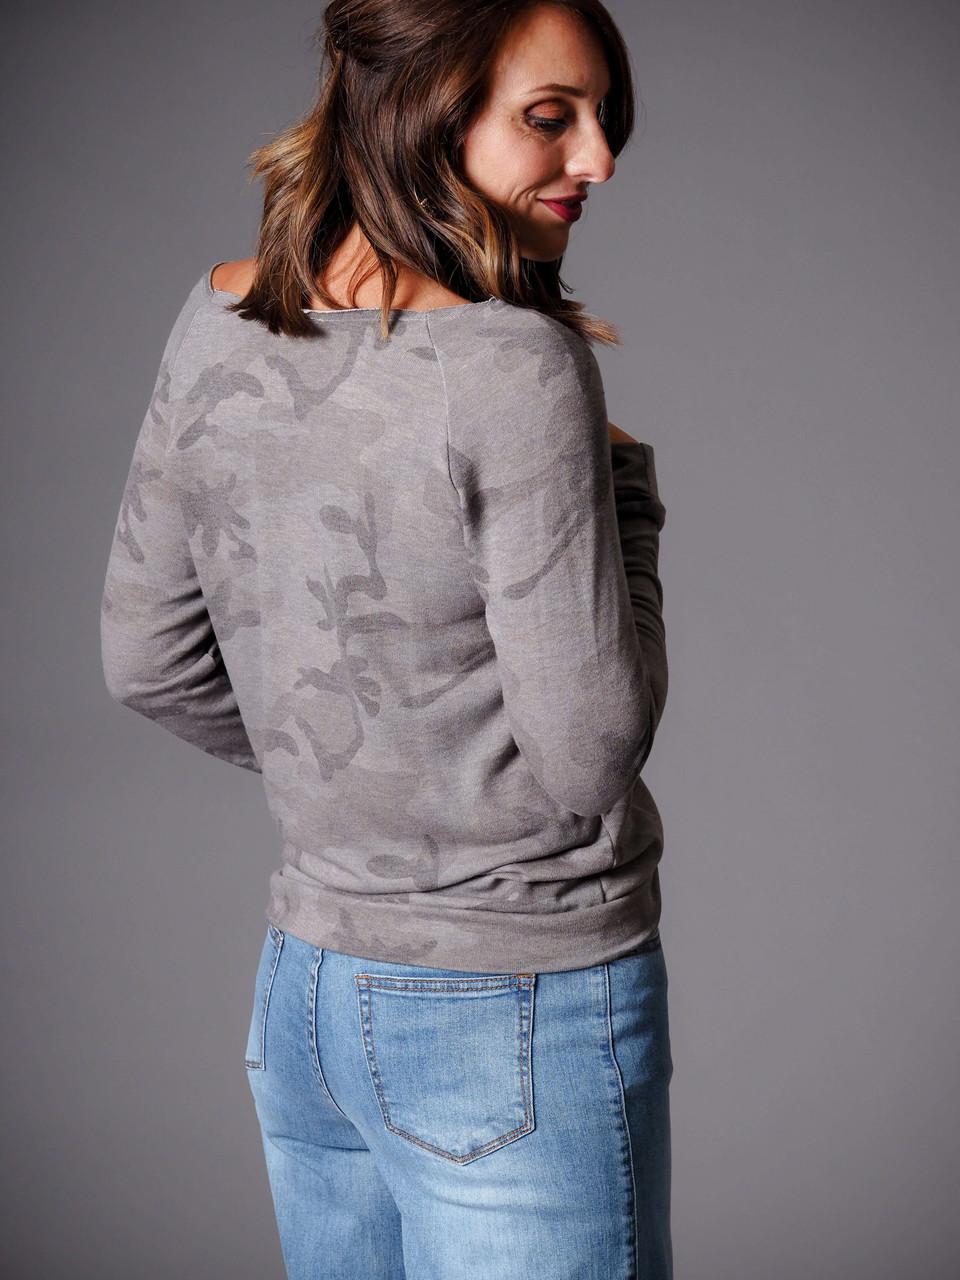 charcoal gray camo top